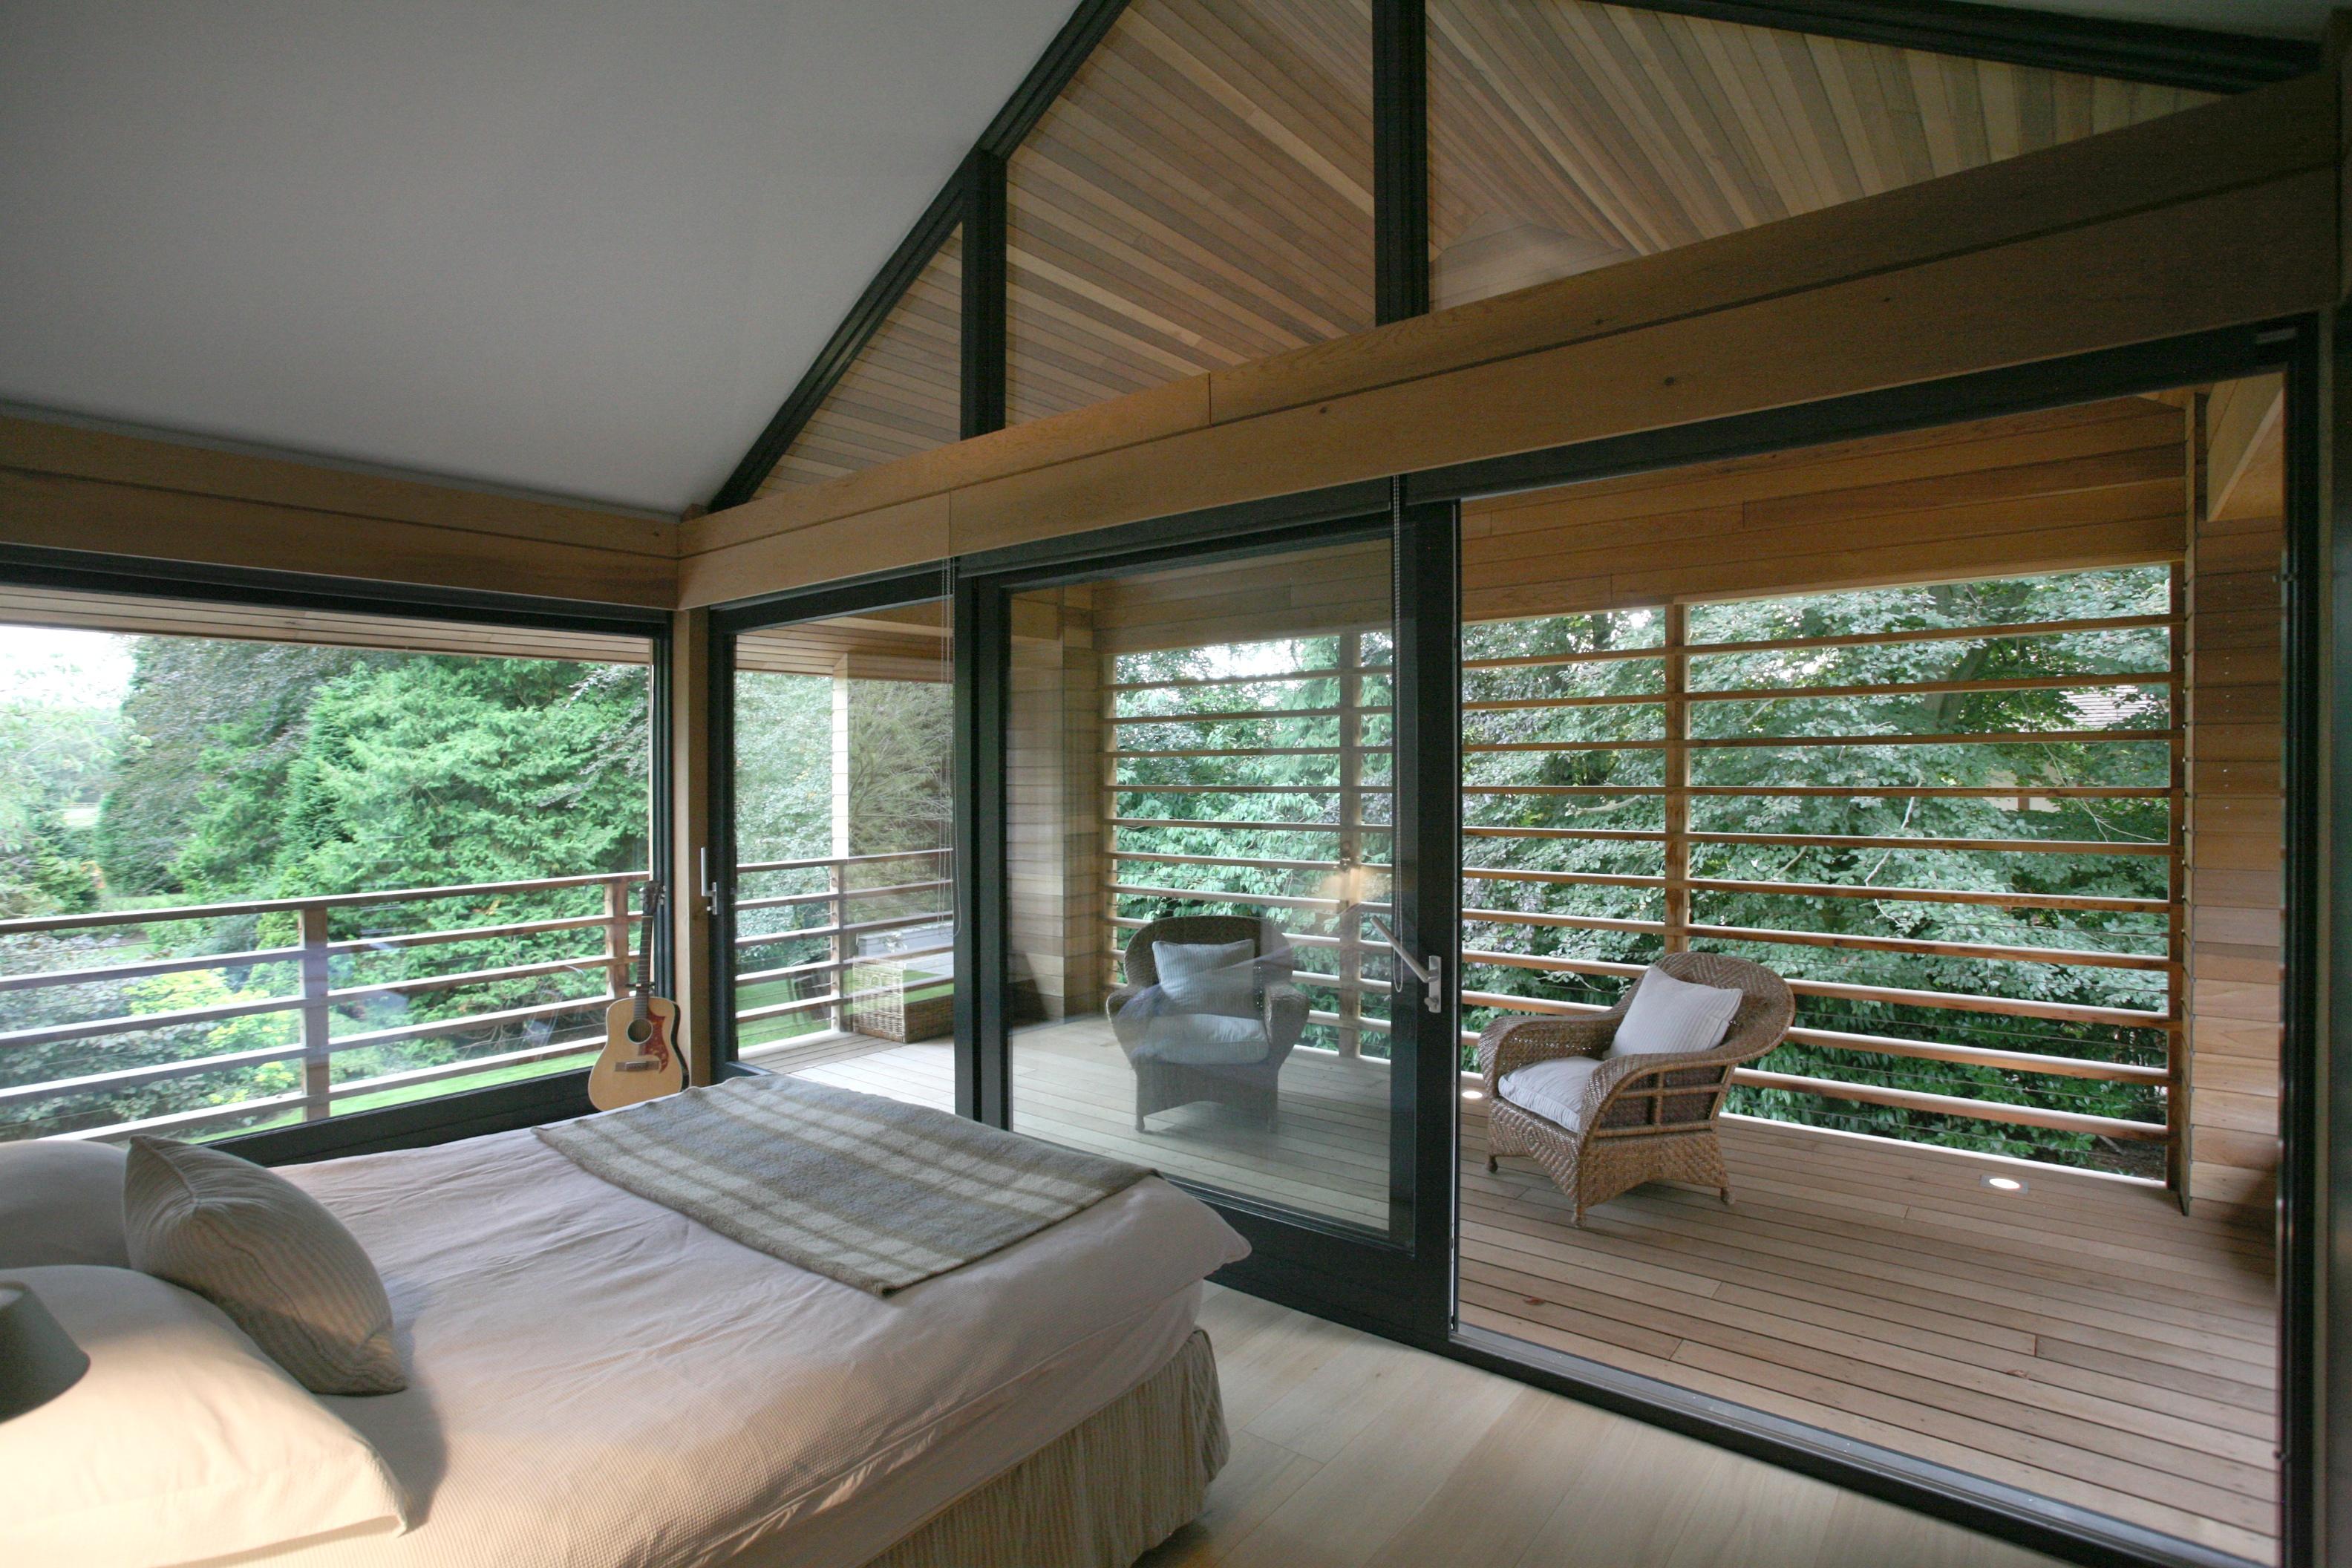 knutsford house cheshire contemporary architecture nicolas tye architecture. Black Bedroom Furniture Sets. Home Design Ideas